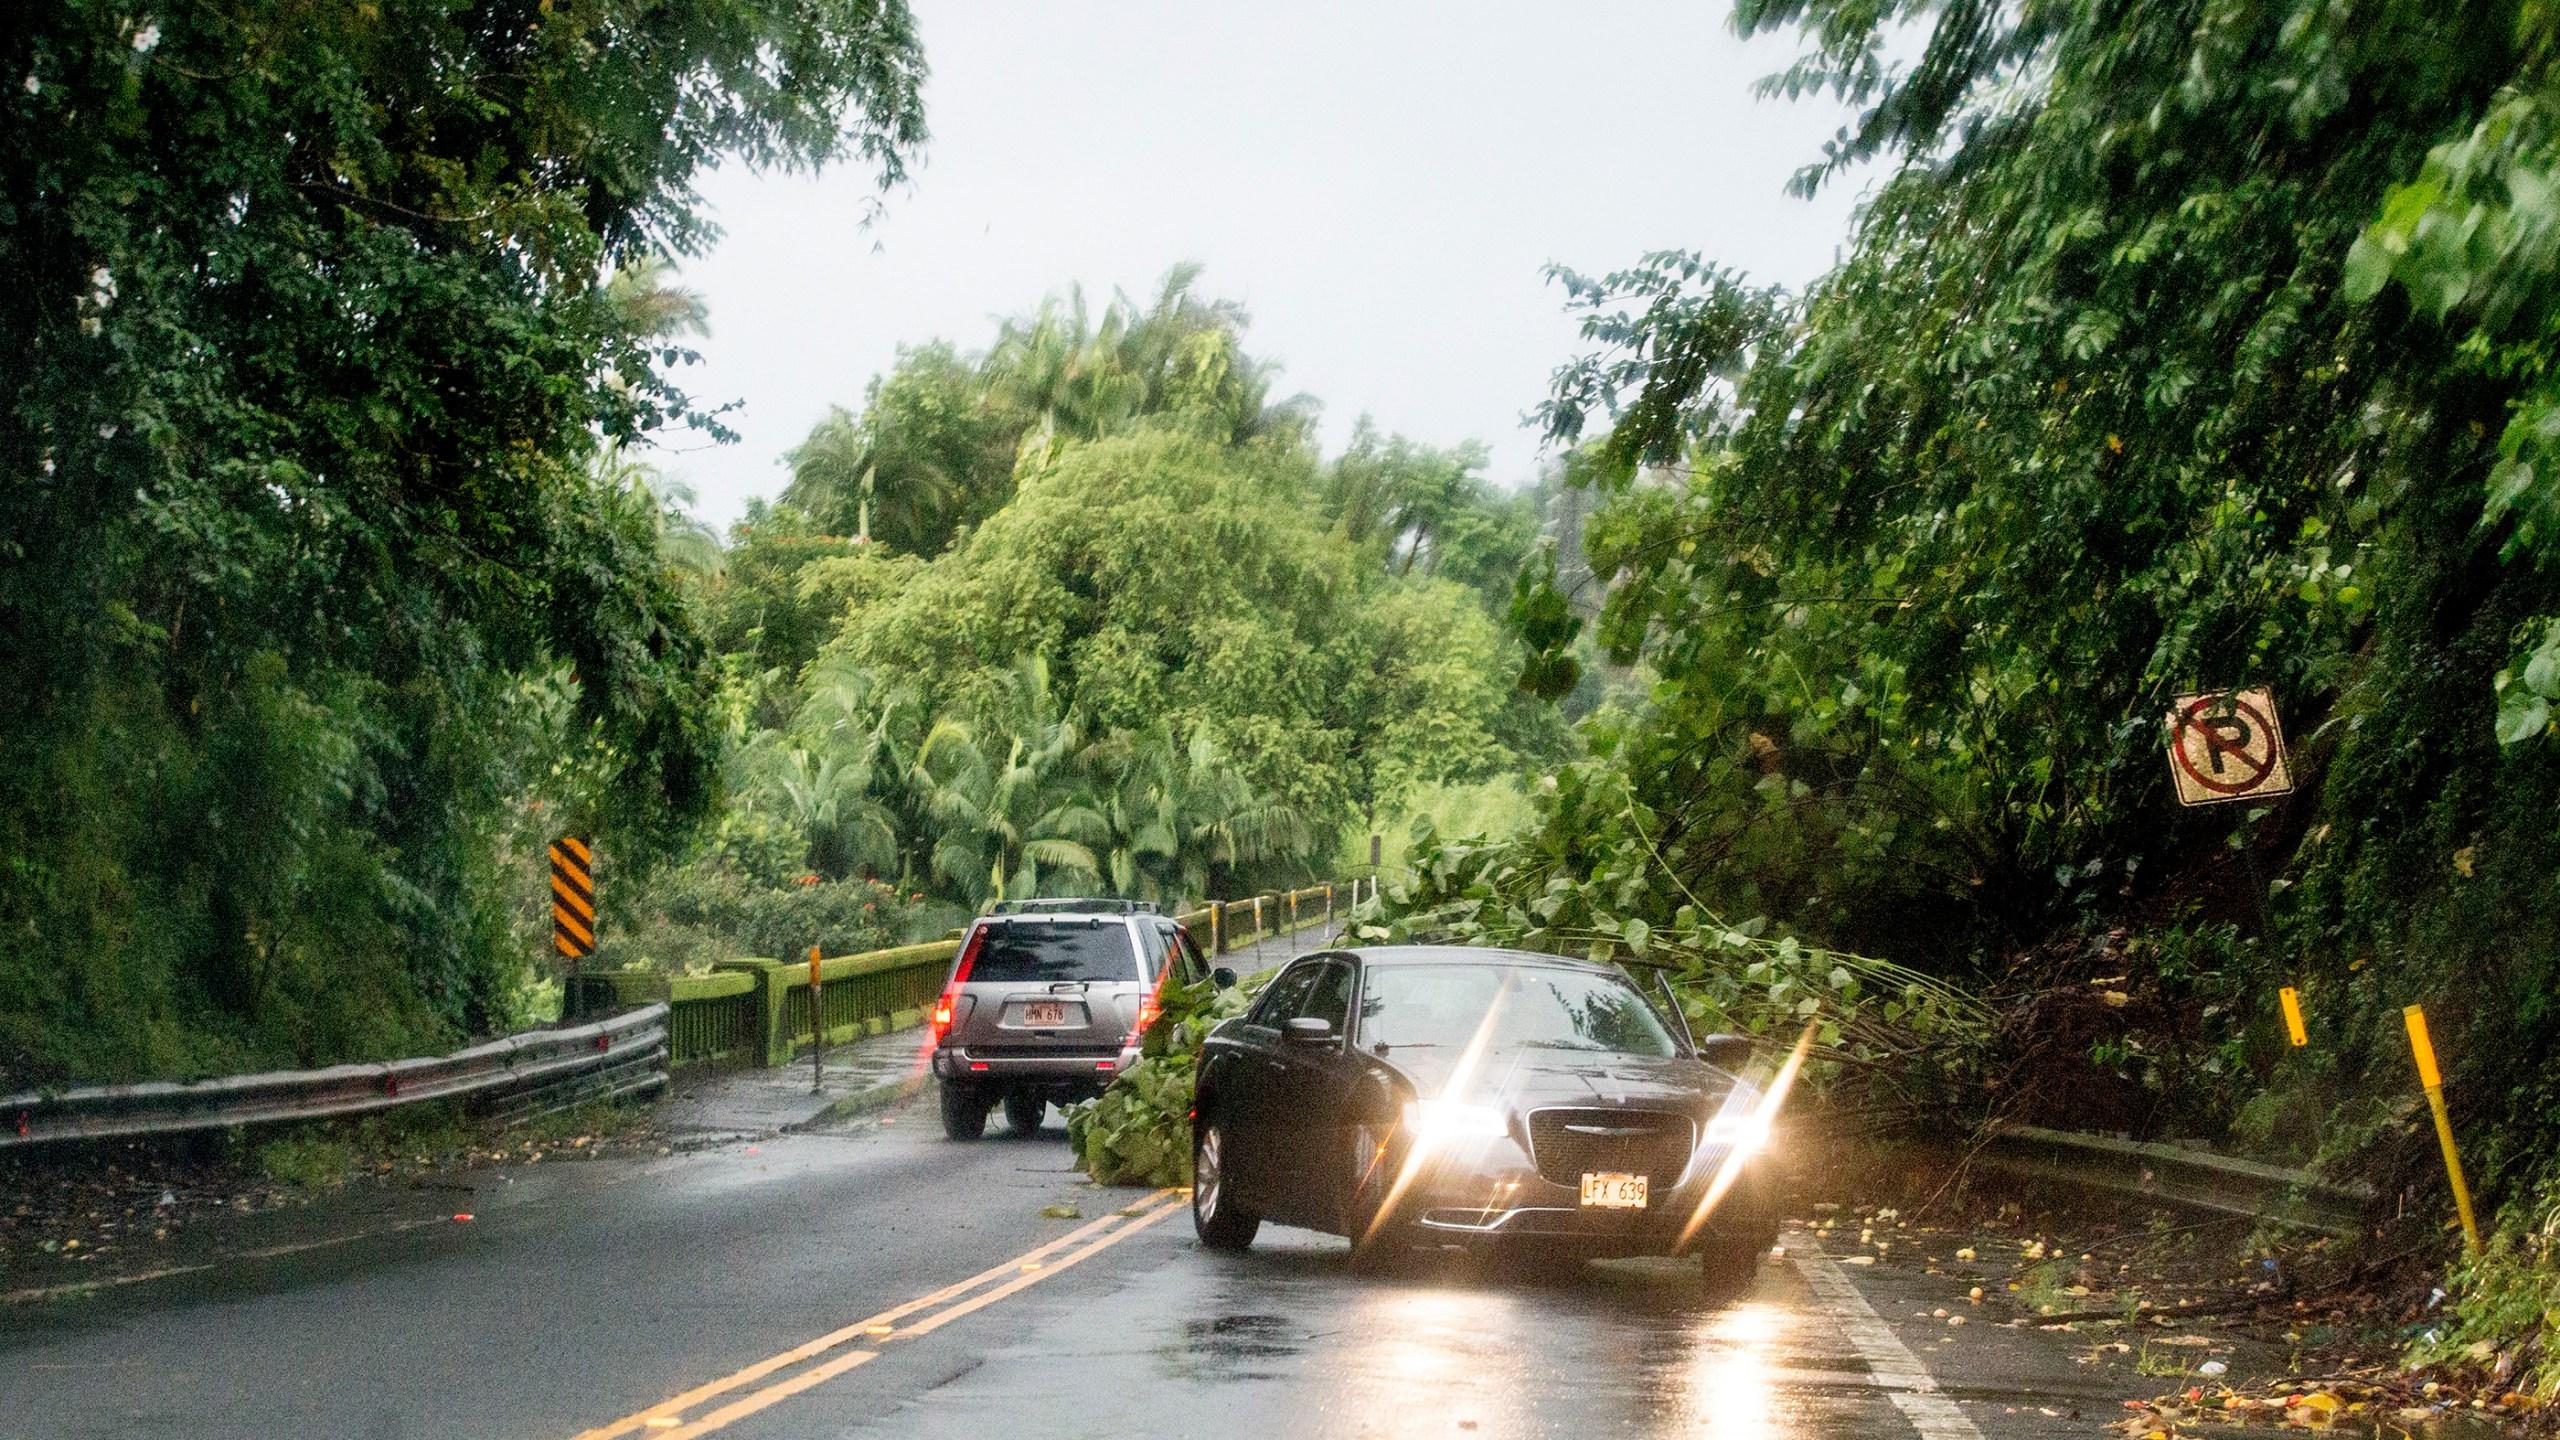 Hurricane_Lane_Hawaii_57323-159532.jpg27232784